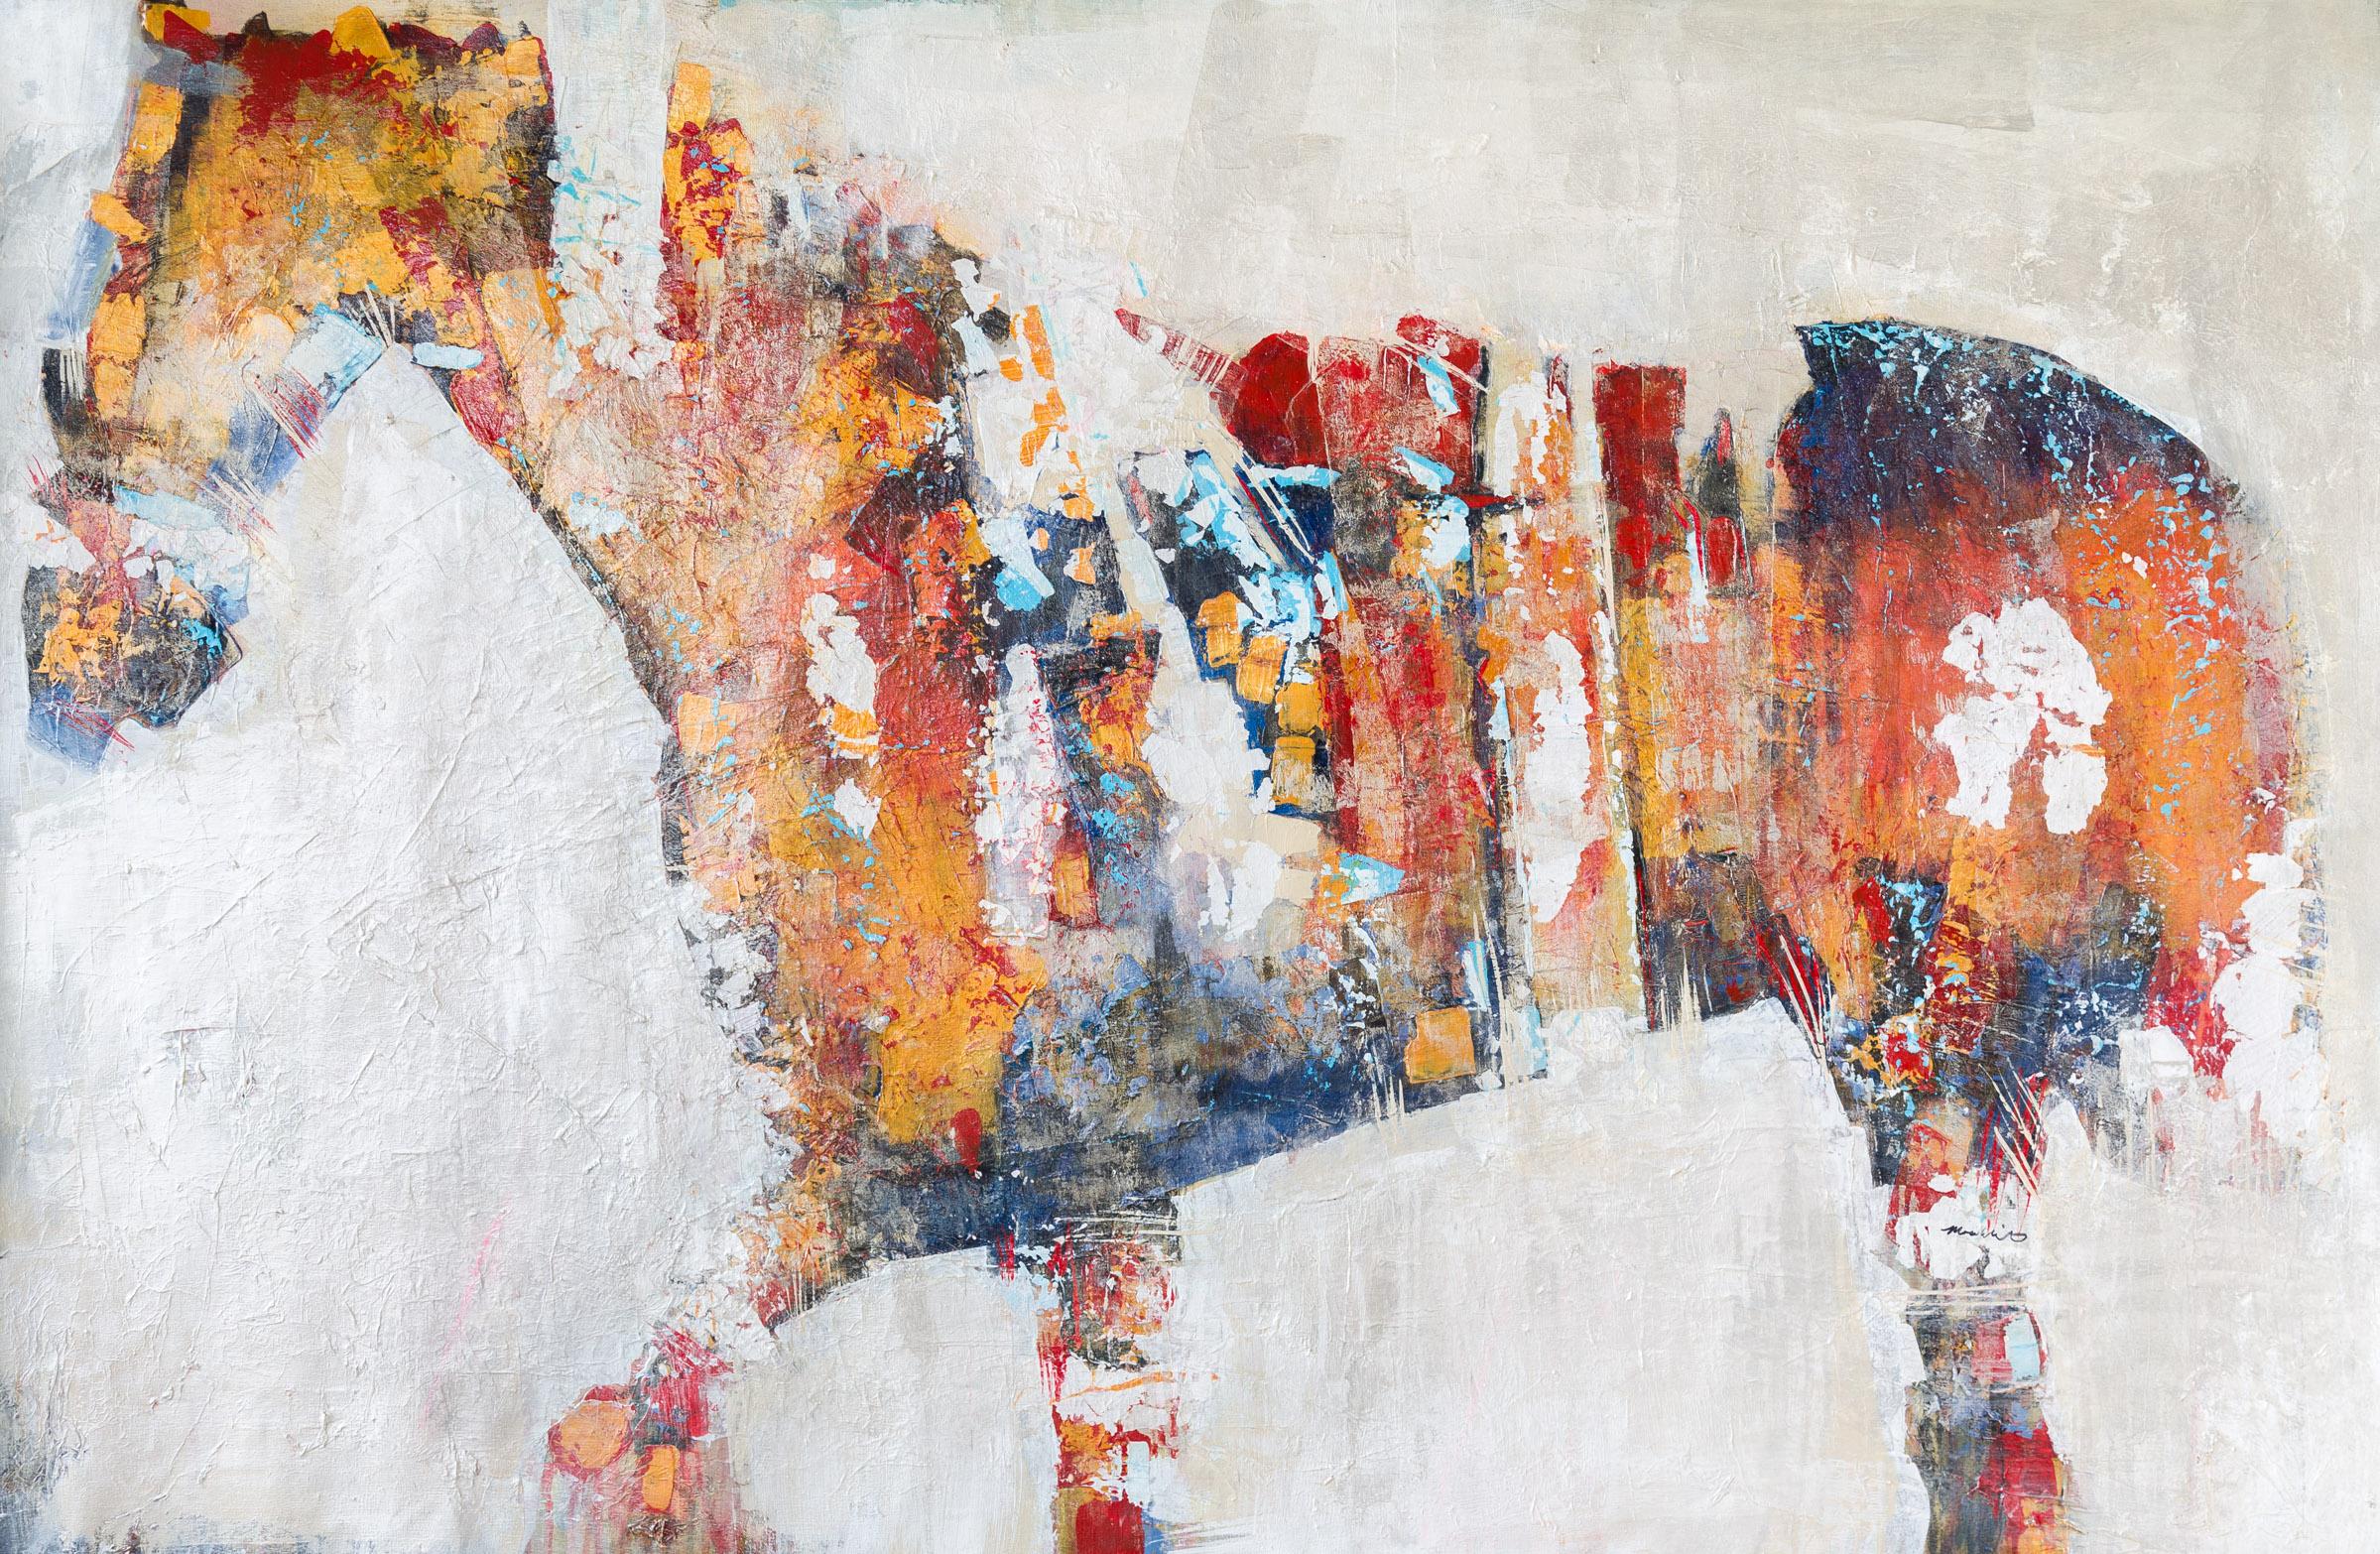 Equine, Lisa Macchiaroli 40